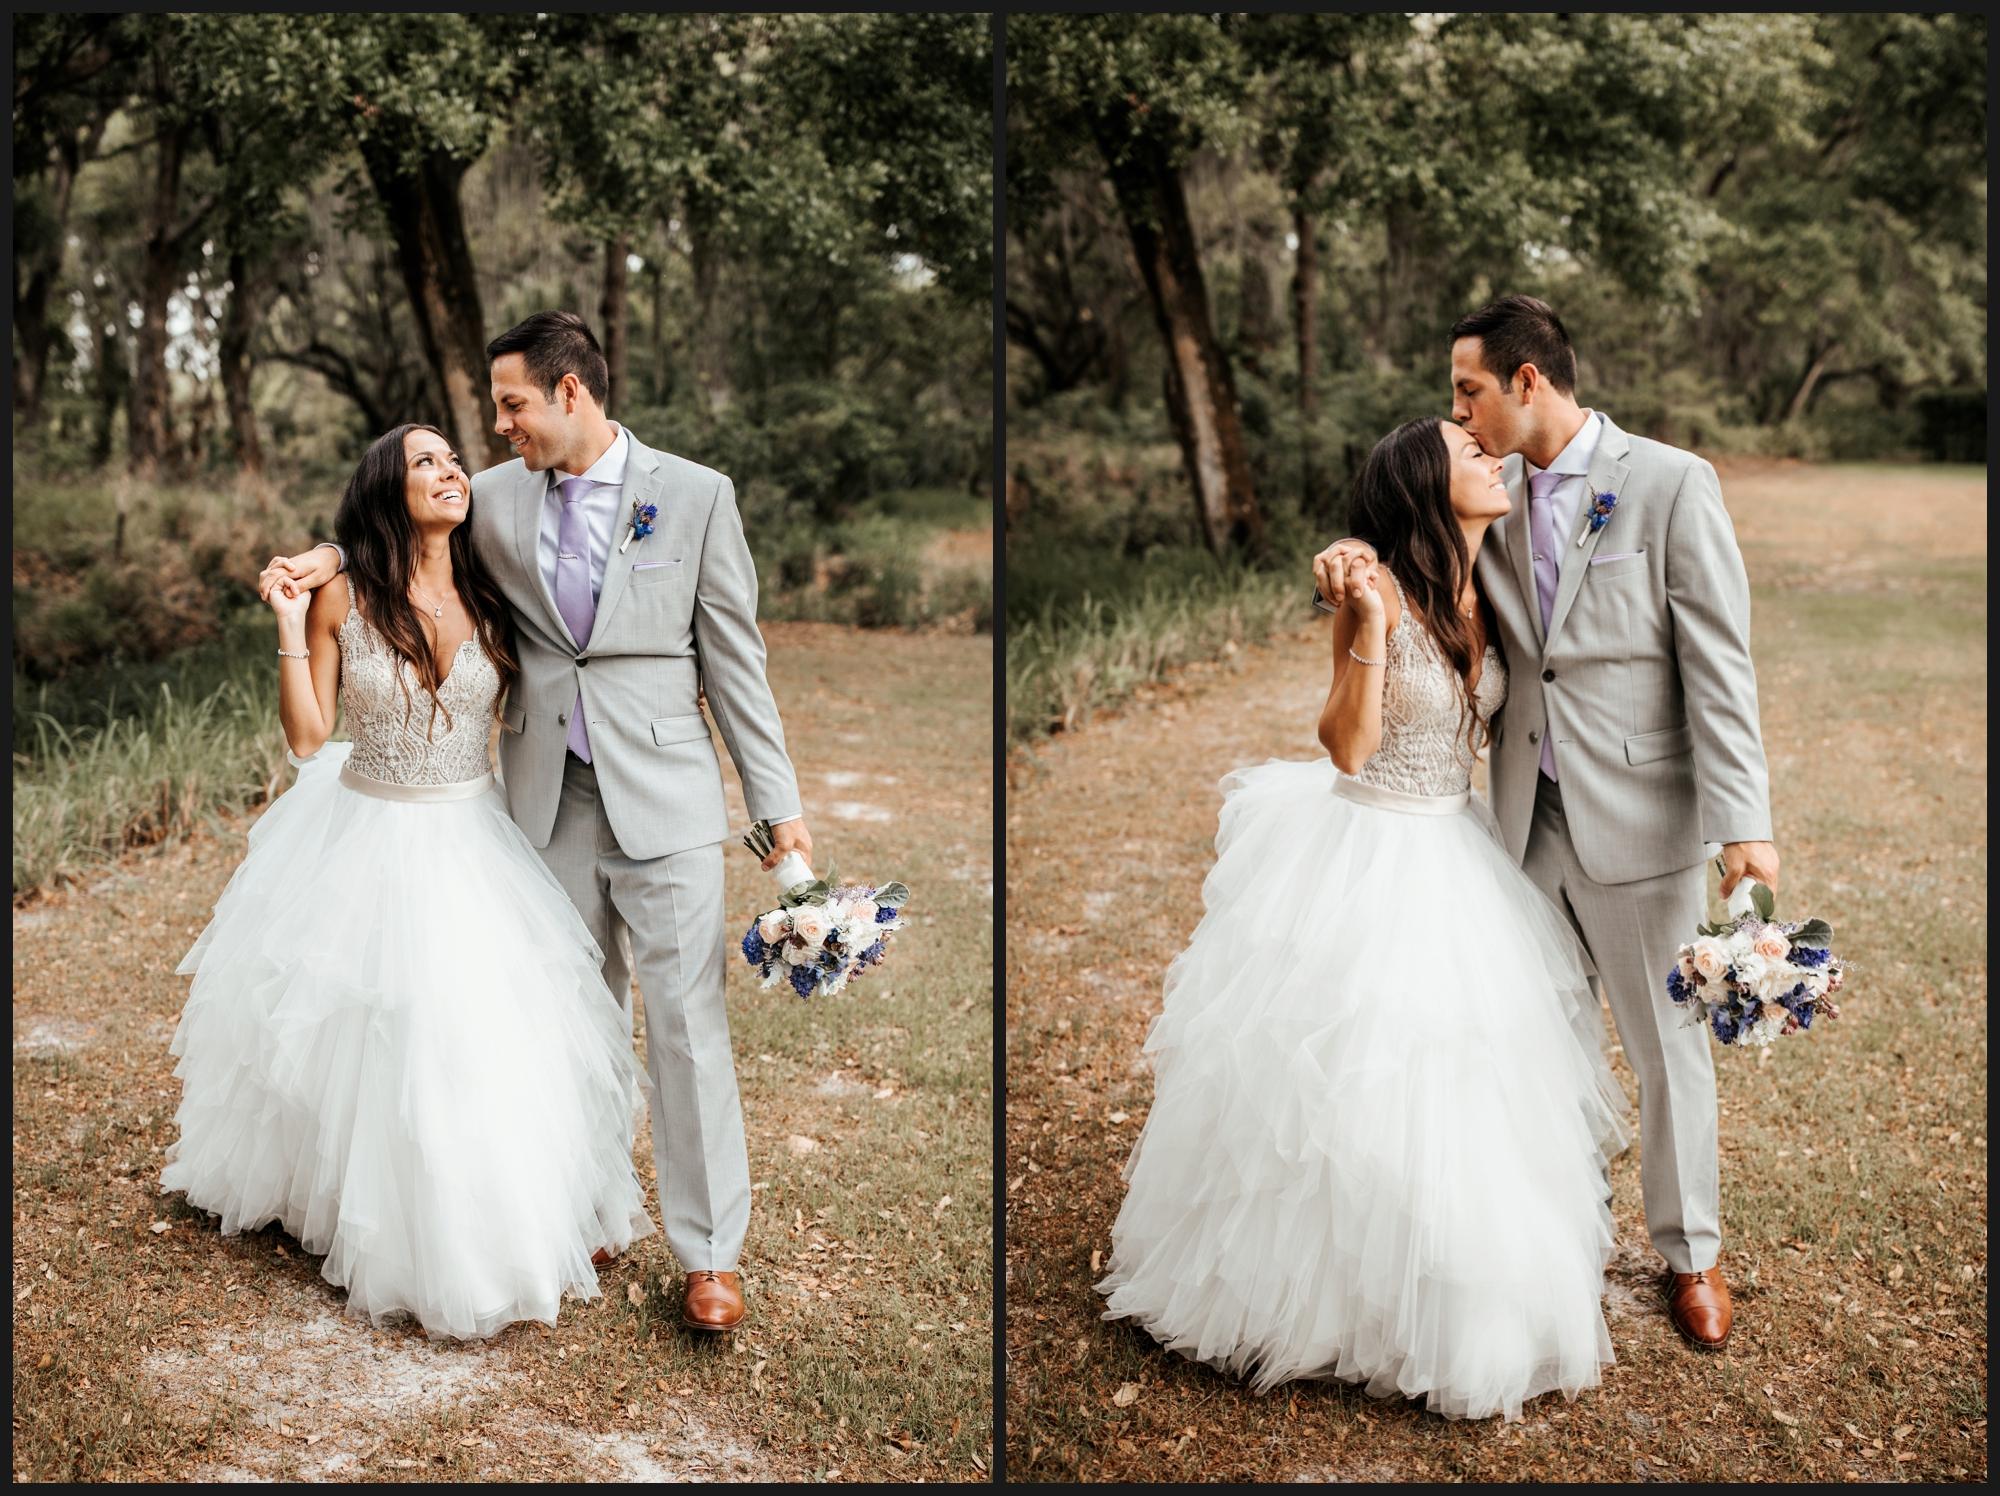 Orlando-Wedding-Photographer-destination-wedding-photographer-florida-wedding-photographer-bohemian-wedding-photographer_1569.jpg